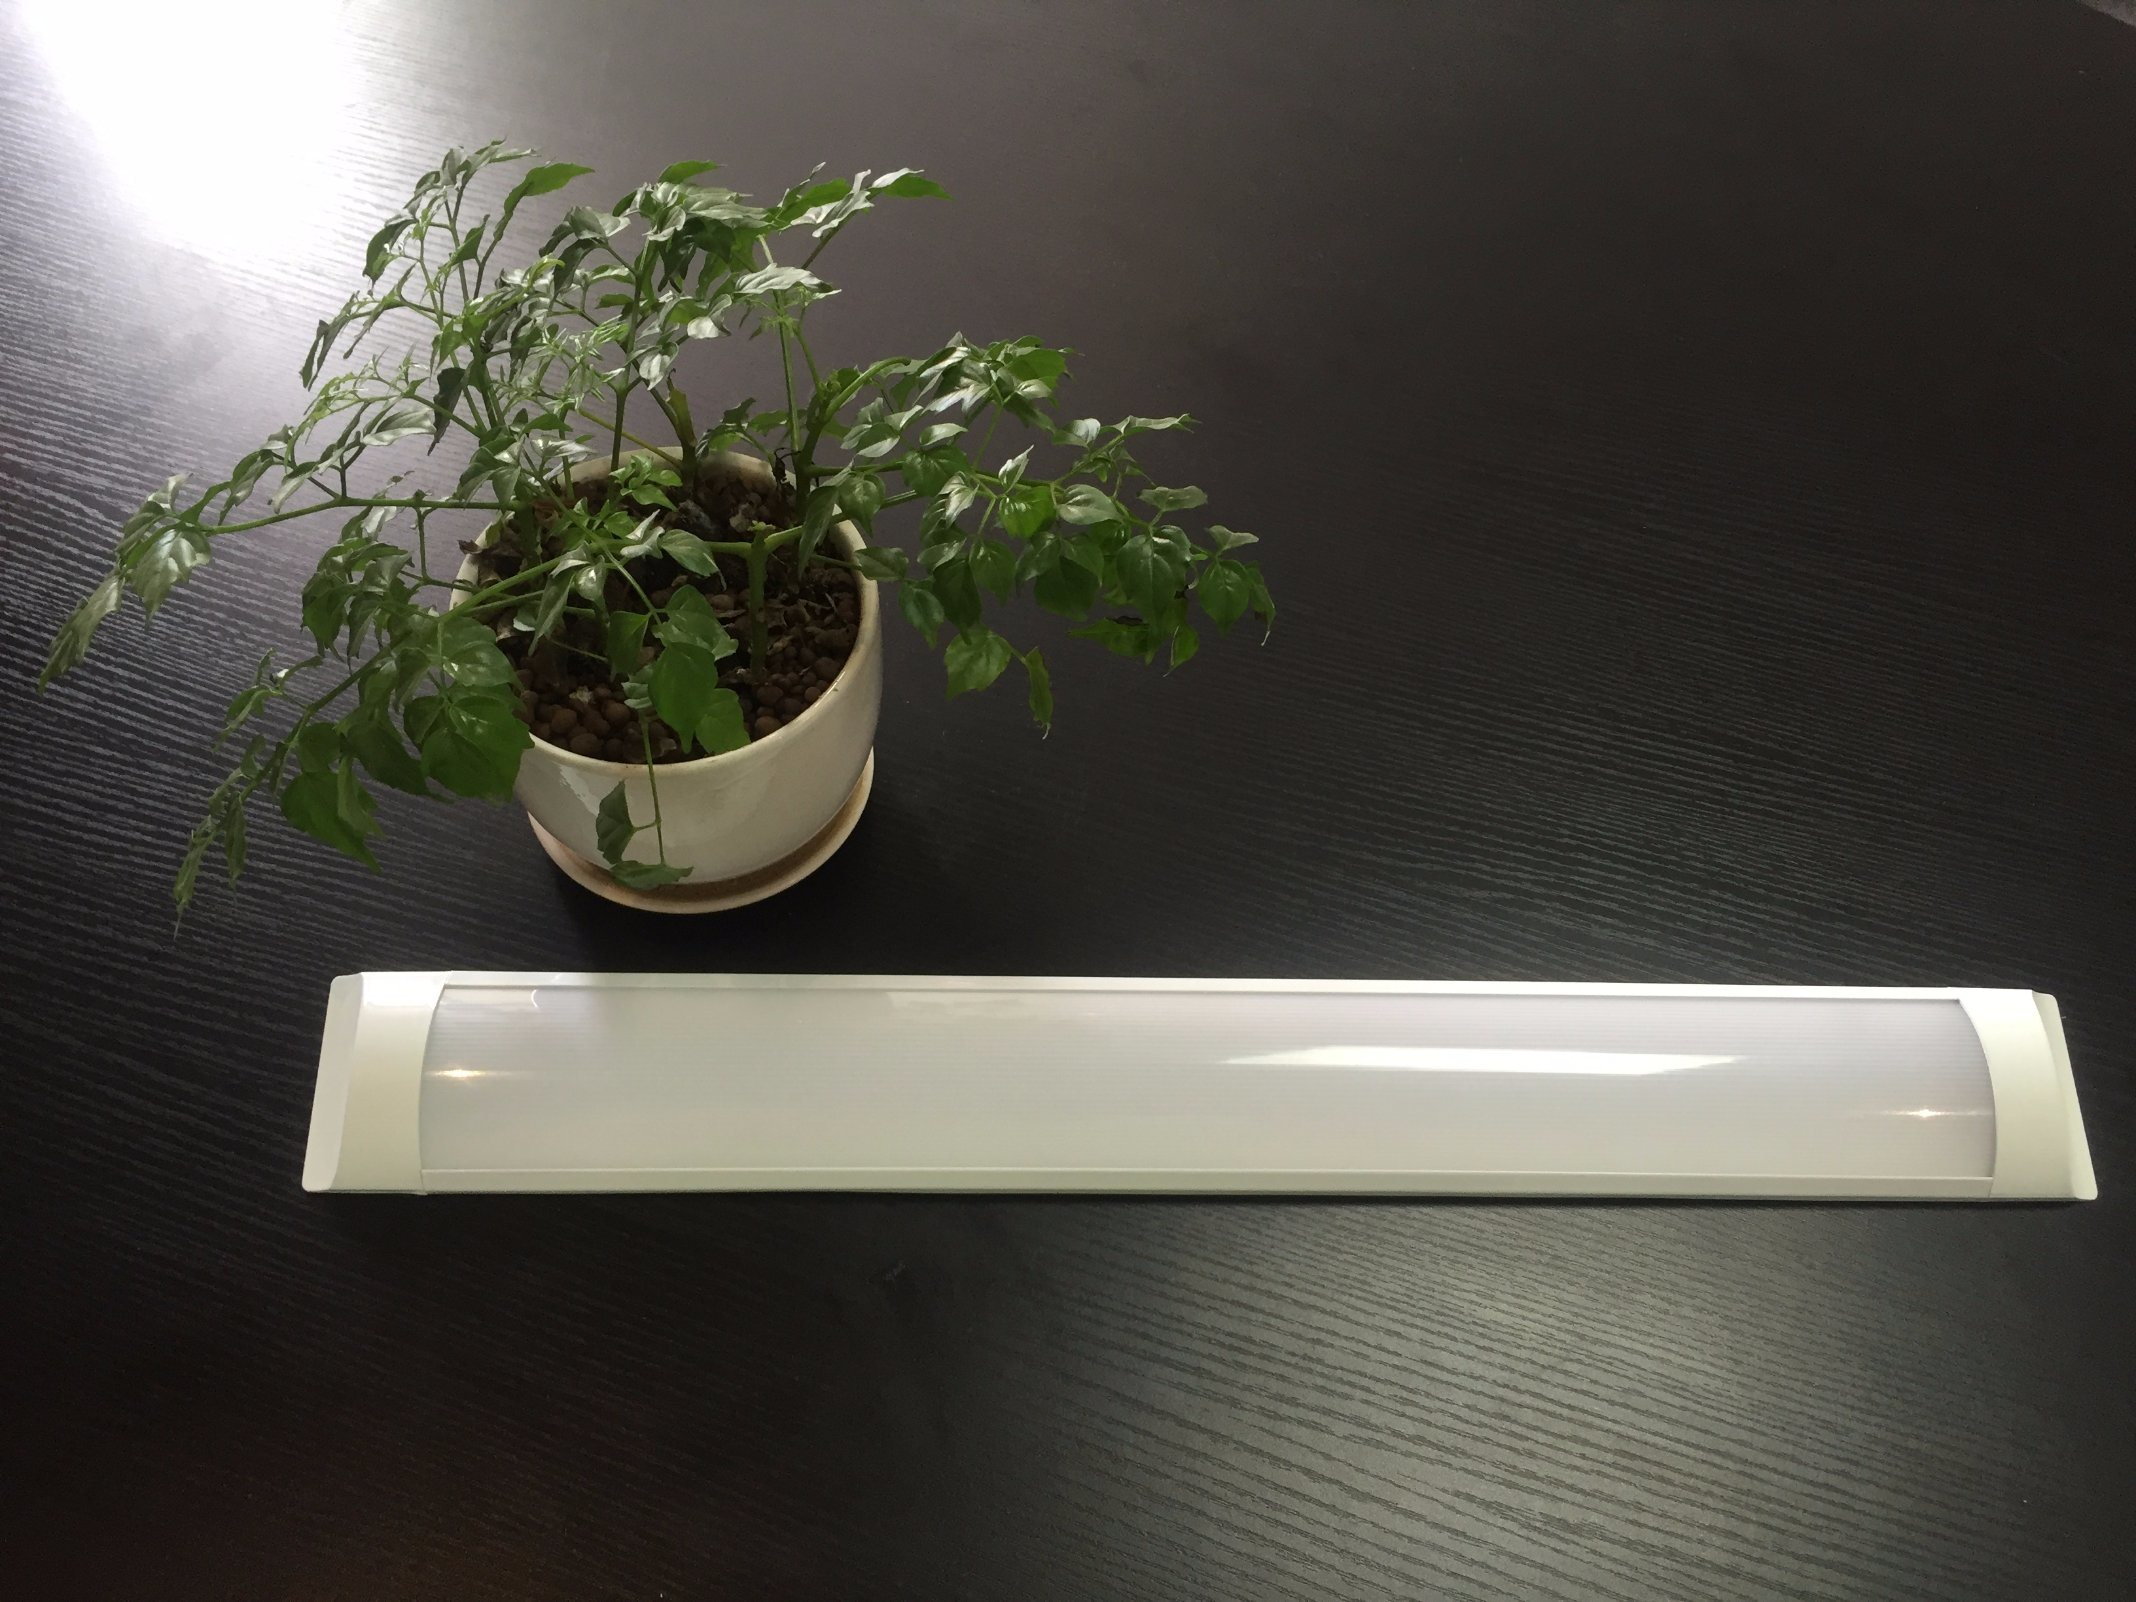 LED 27W IP20 Slim Dustproof Fluorescent Tube